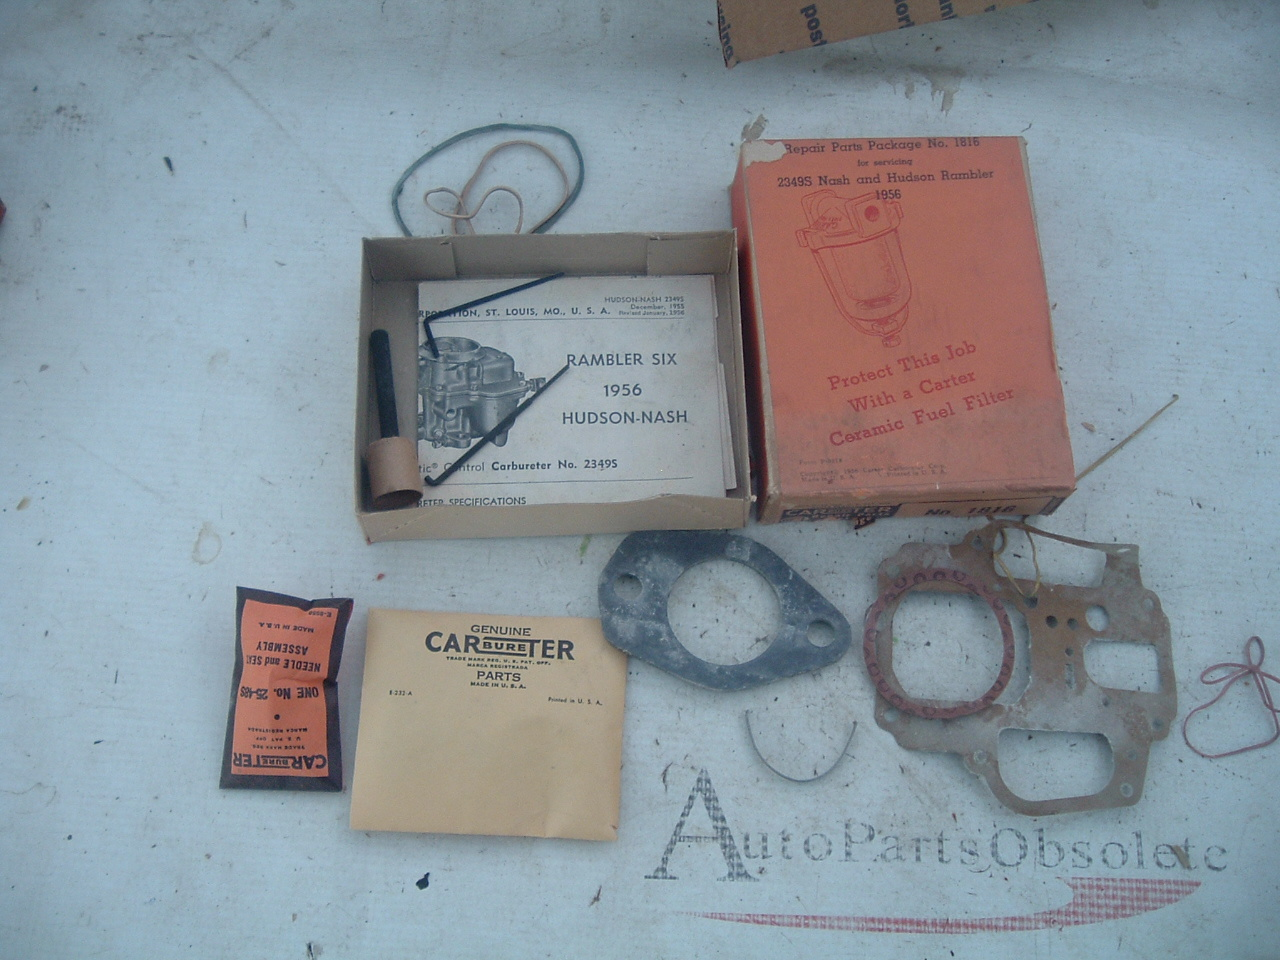 1956 nash hudson rambler carter 1 barrel carburetor rebuild kit 2349s 2349-S